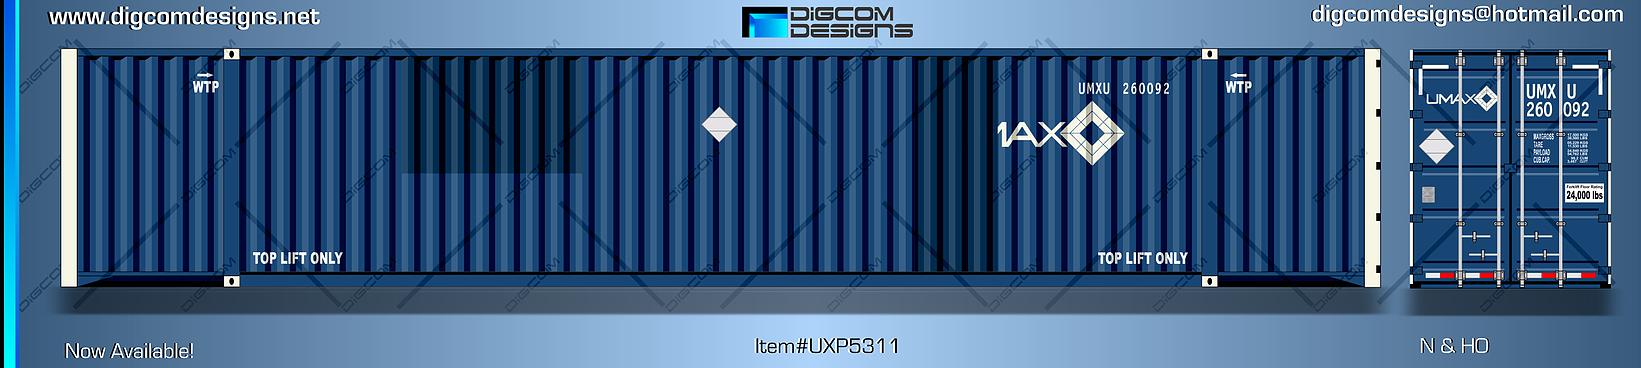 DIGCOMDESIGNSUXP5311